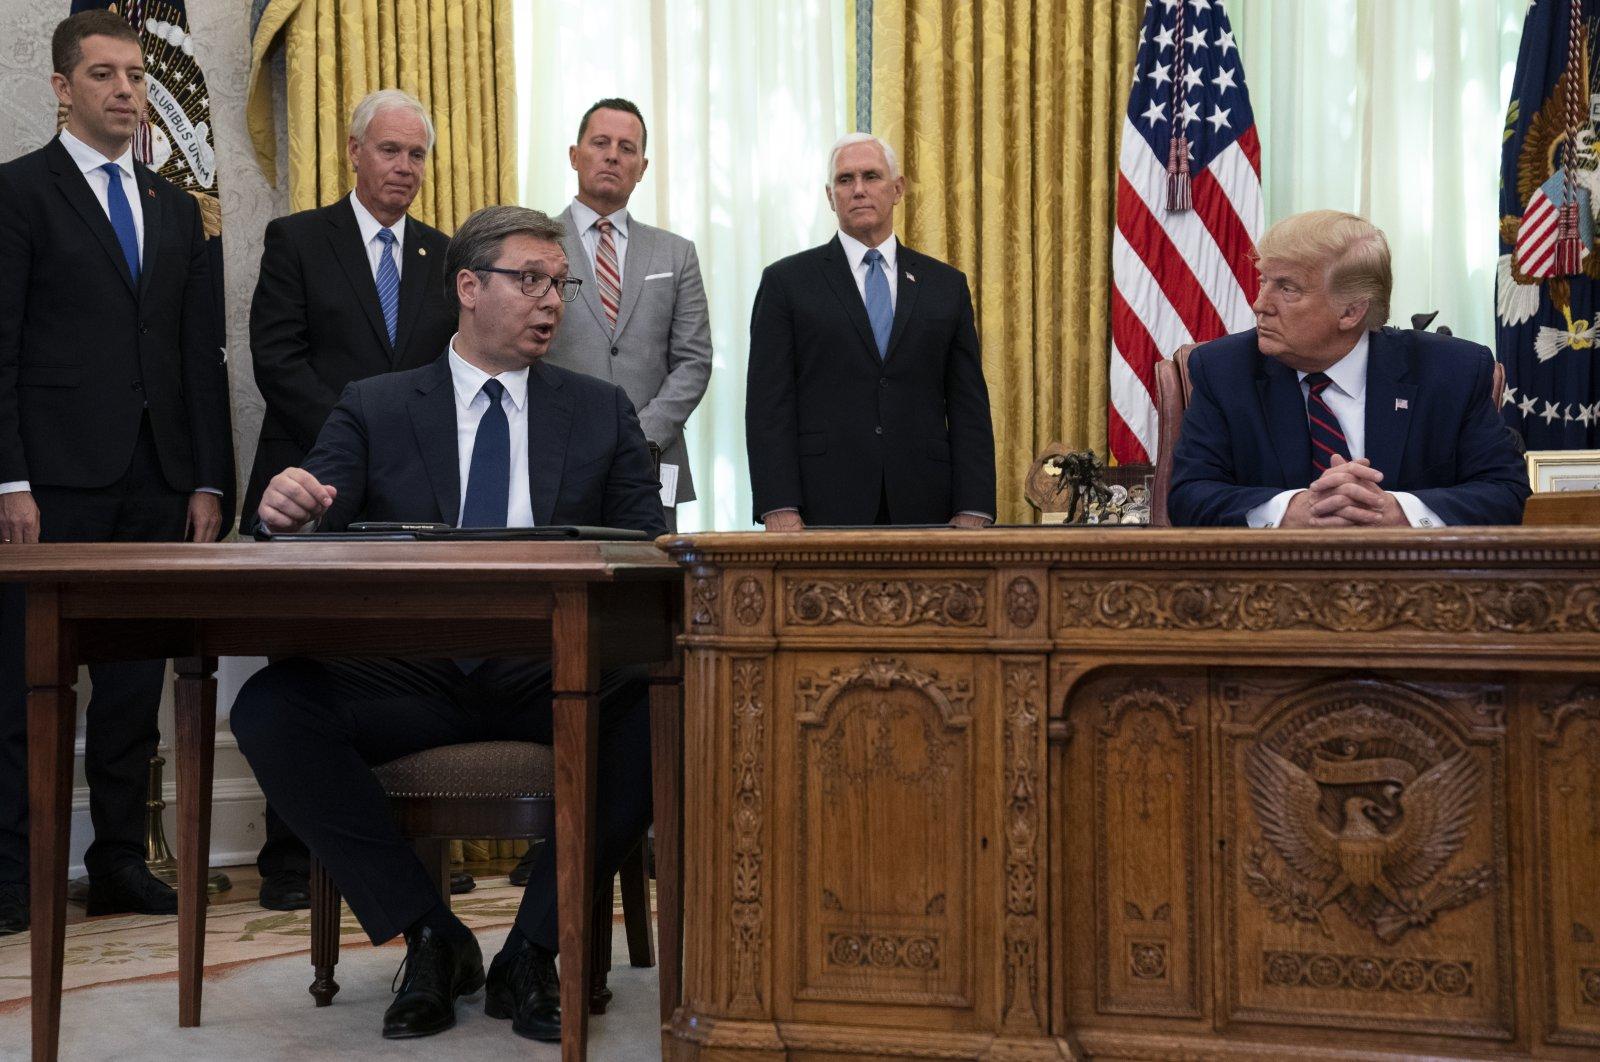 President Donald Trump listens to Serbian President Aleksandar Vucic speak during a signing ceremony with Kosovar Prime Minister Avdullah Hoti at the White House, Washington, Friday, Sept. 4, 2020. (AP Photo)